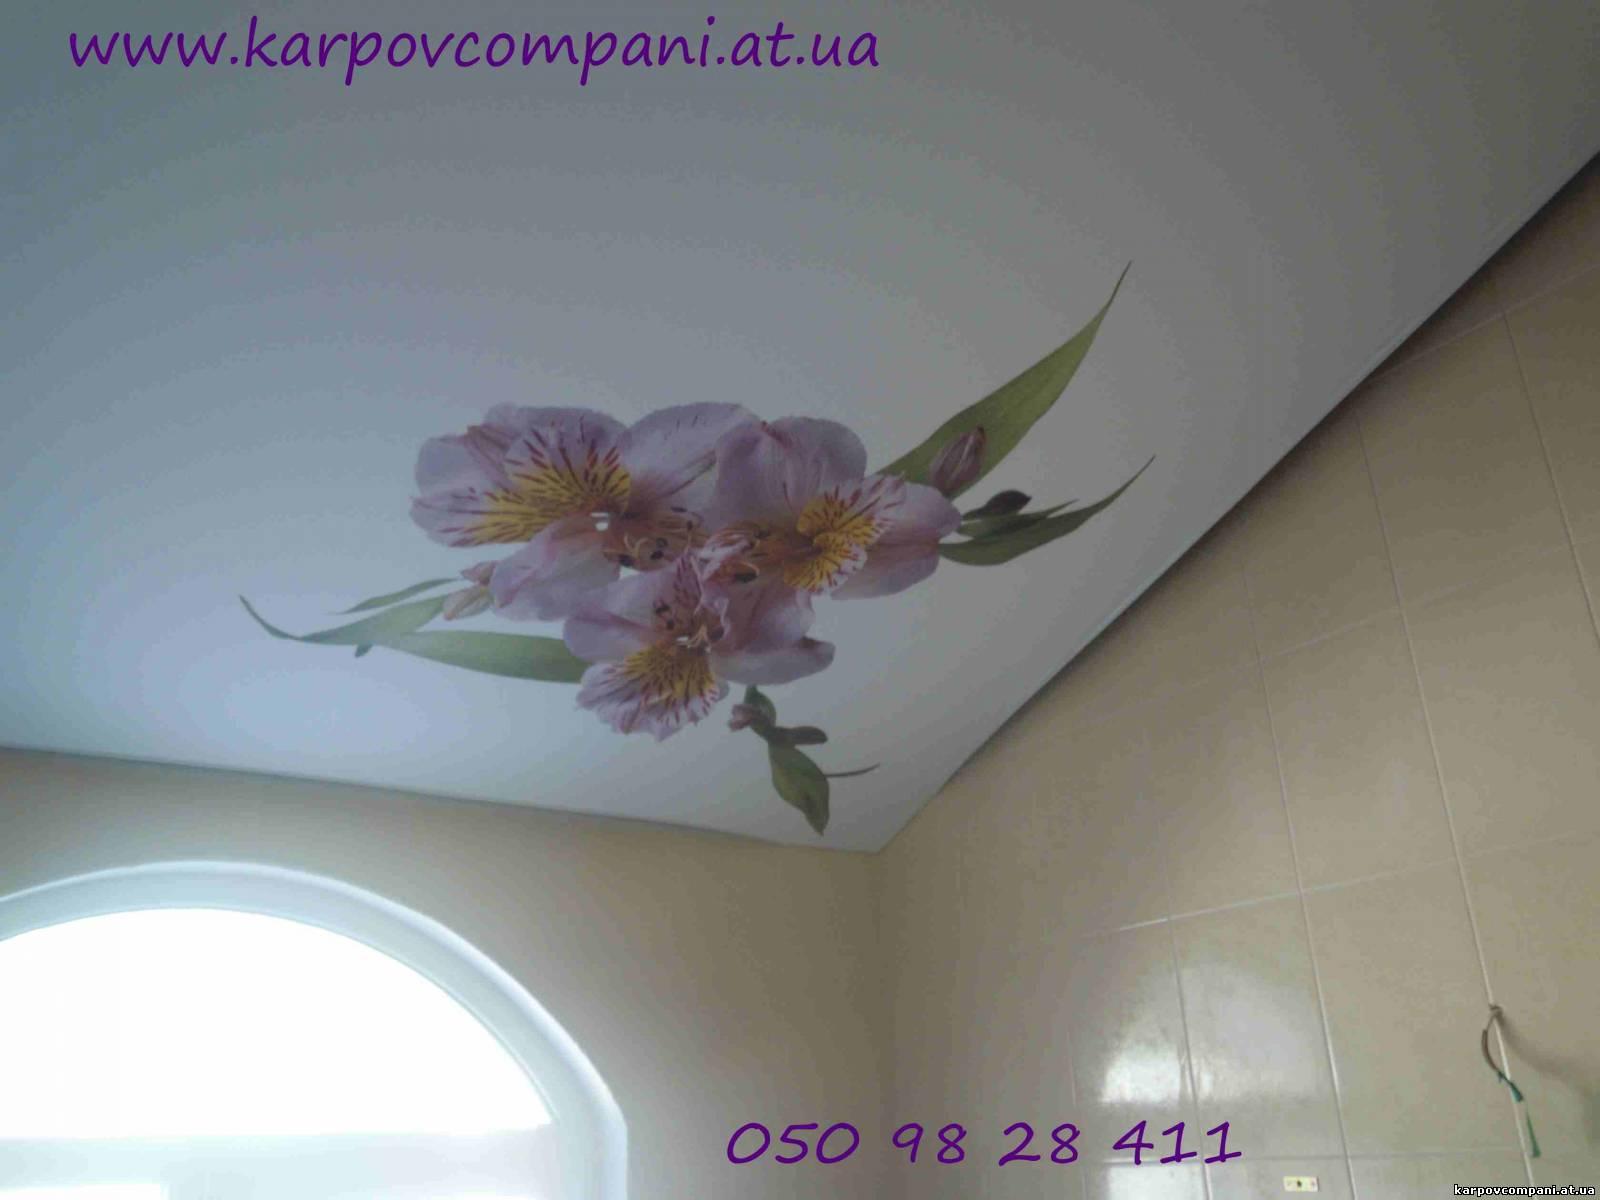 Фото цветов на угол на натяжные потолки